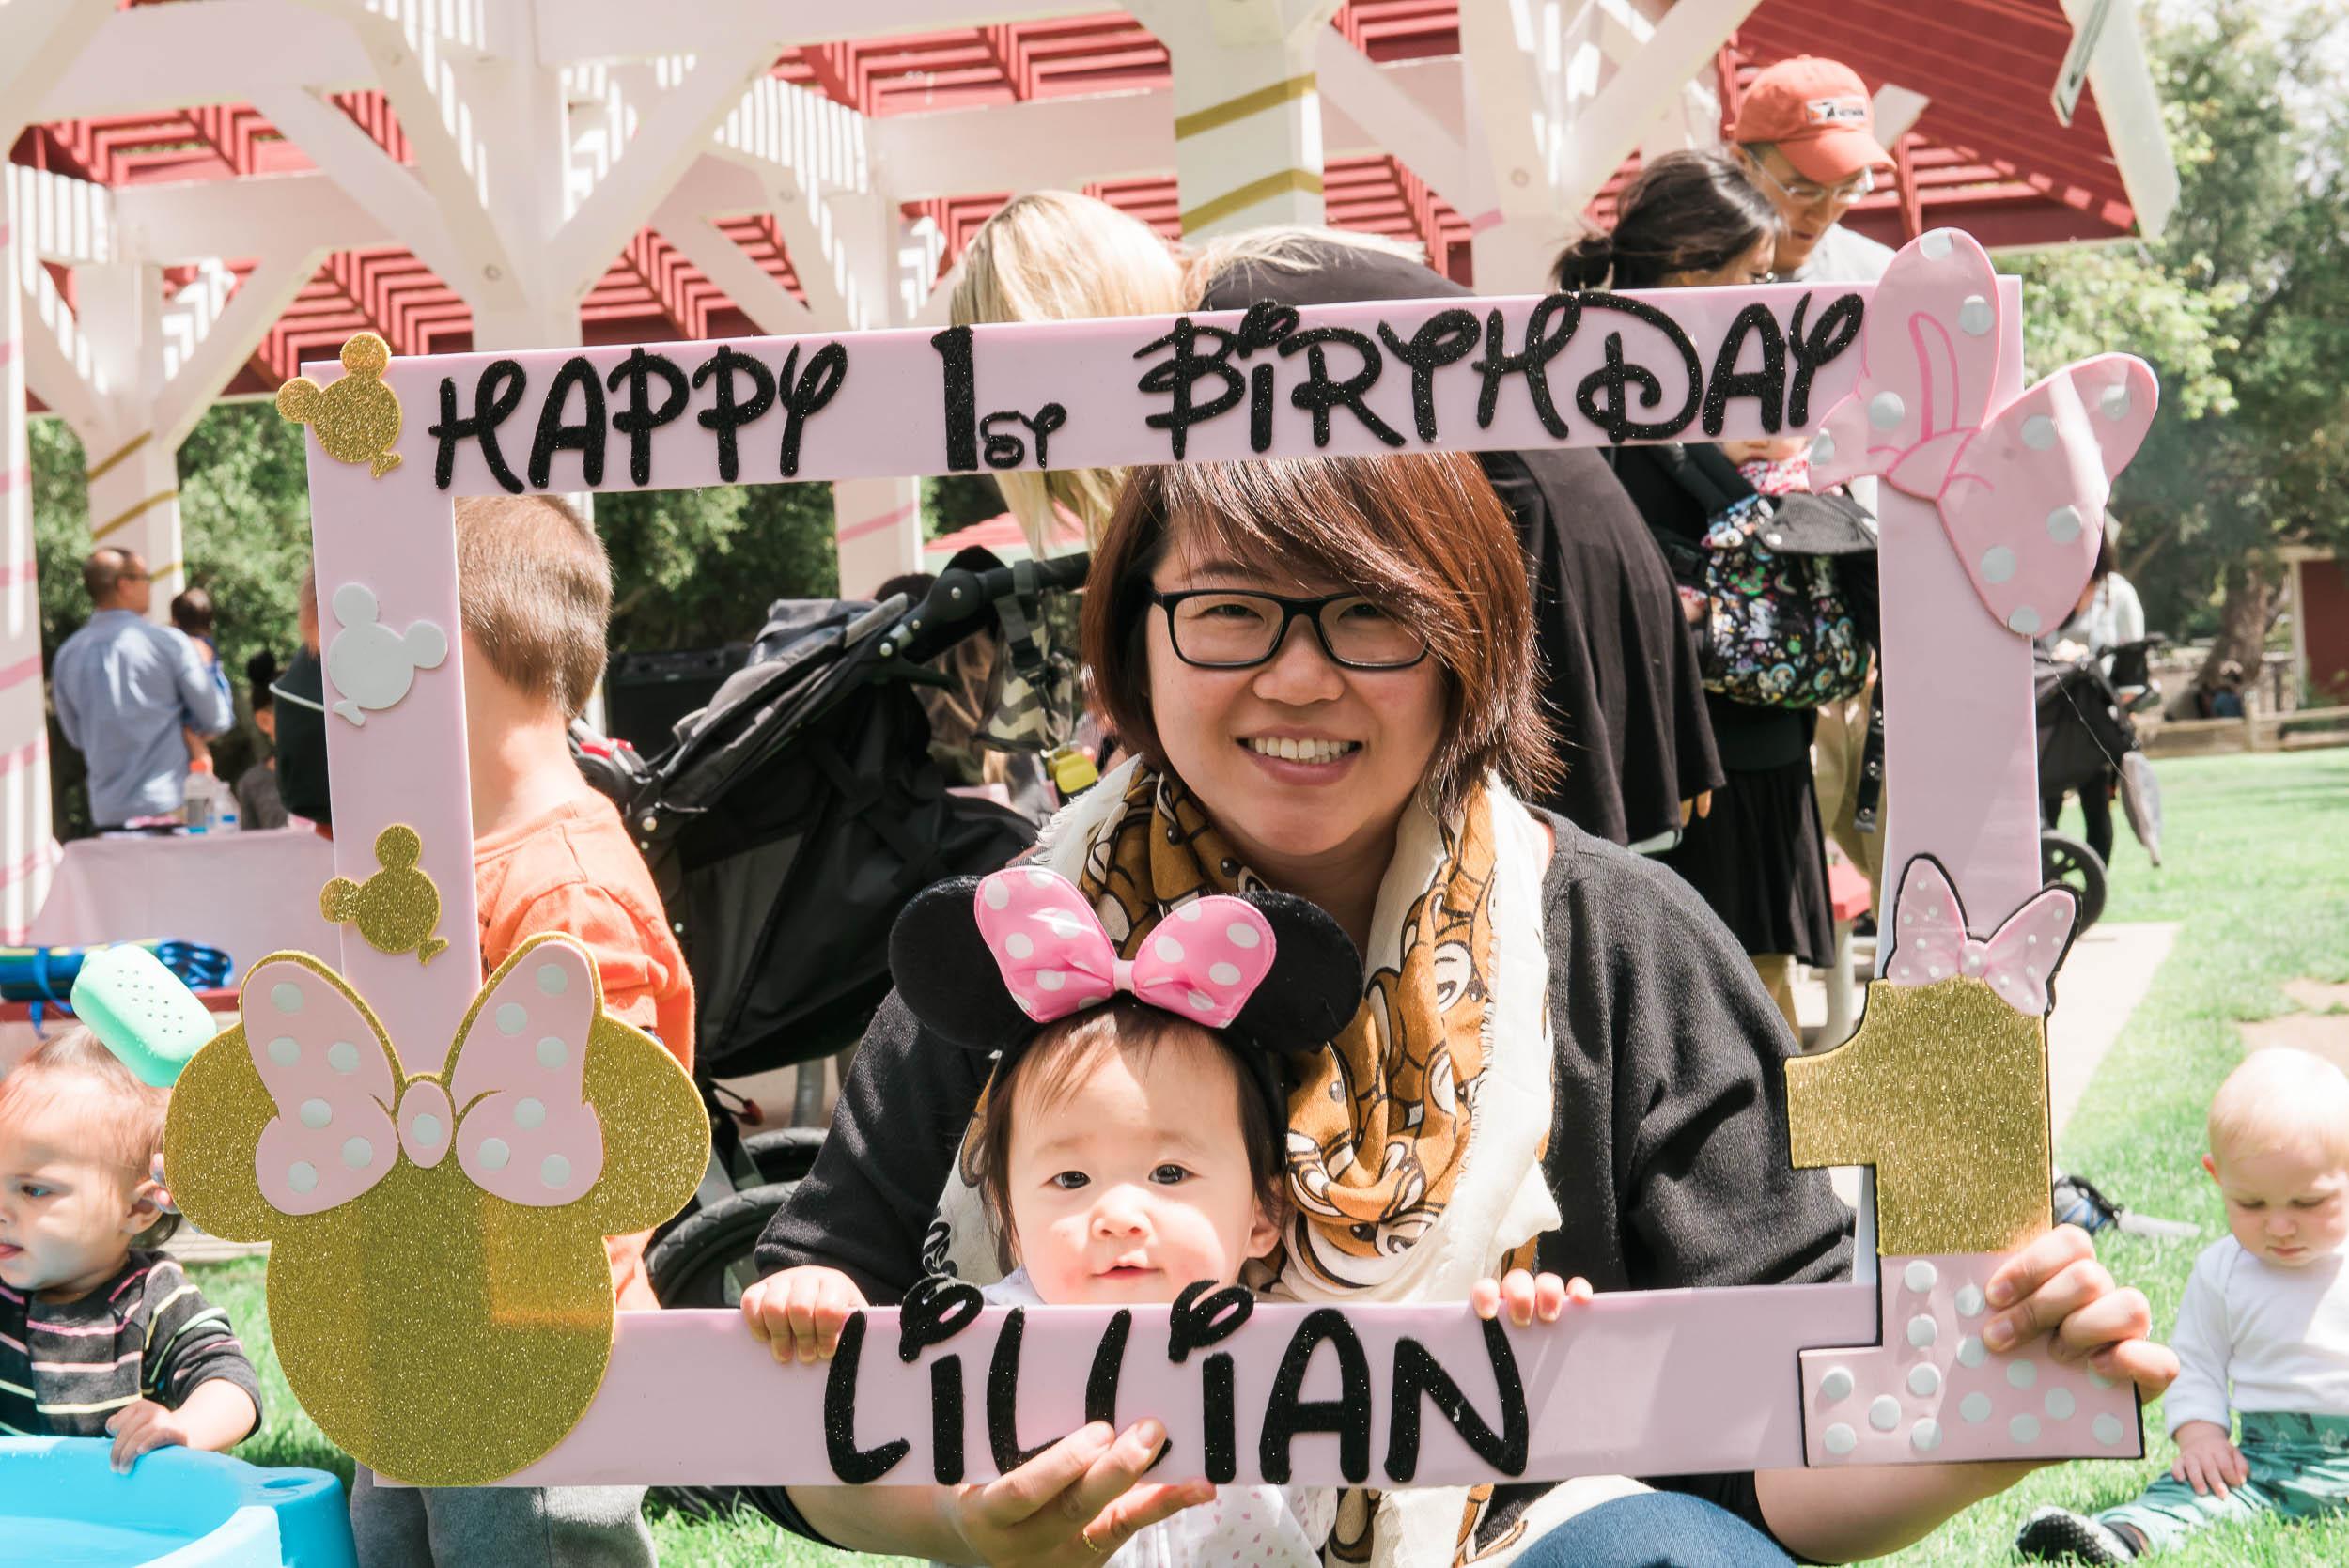 Bryan-Miraflor-Photography-Lillian's-1st-Birthday-Irvine-Railroad-Park-20170409-0042.jpg